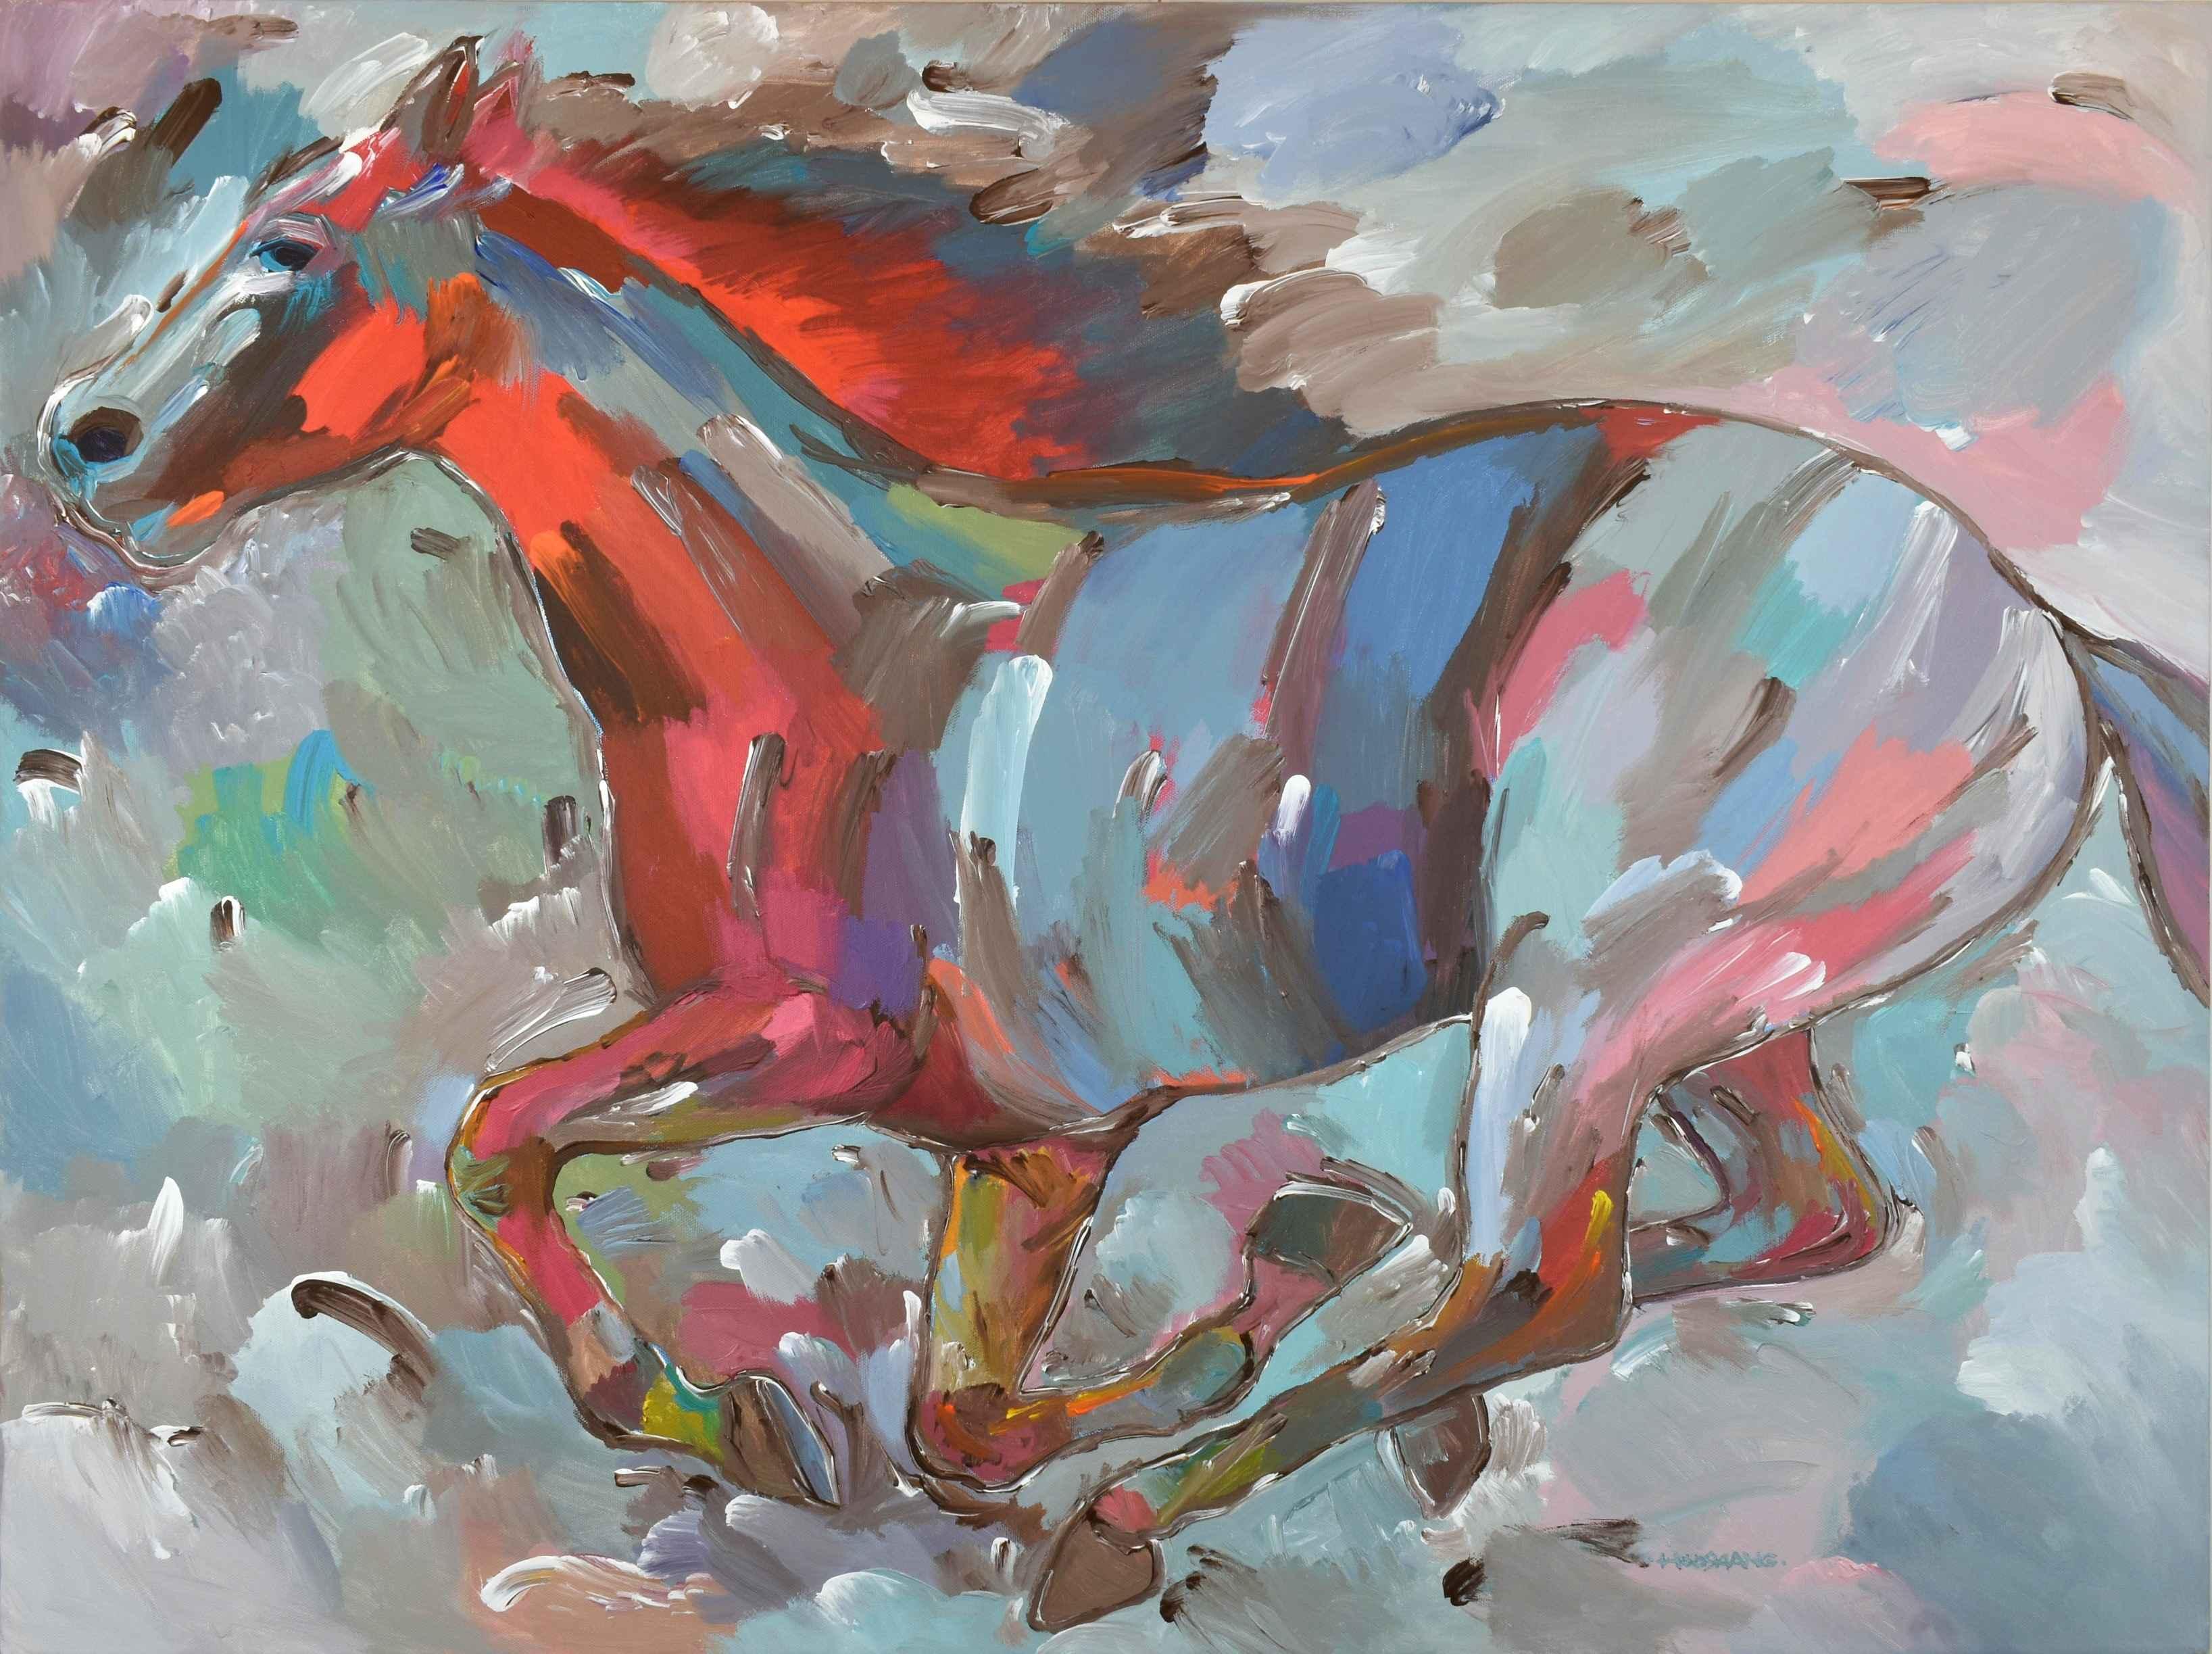 Fiery Runner by  Hooshang Khorasani - Masterpiece Online